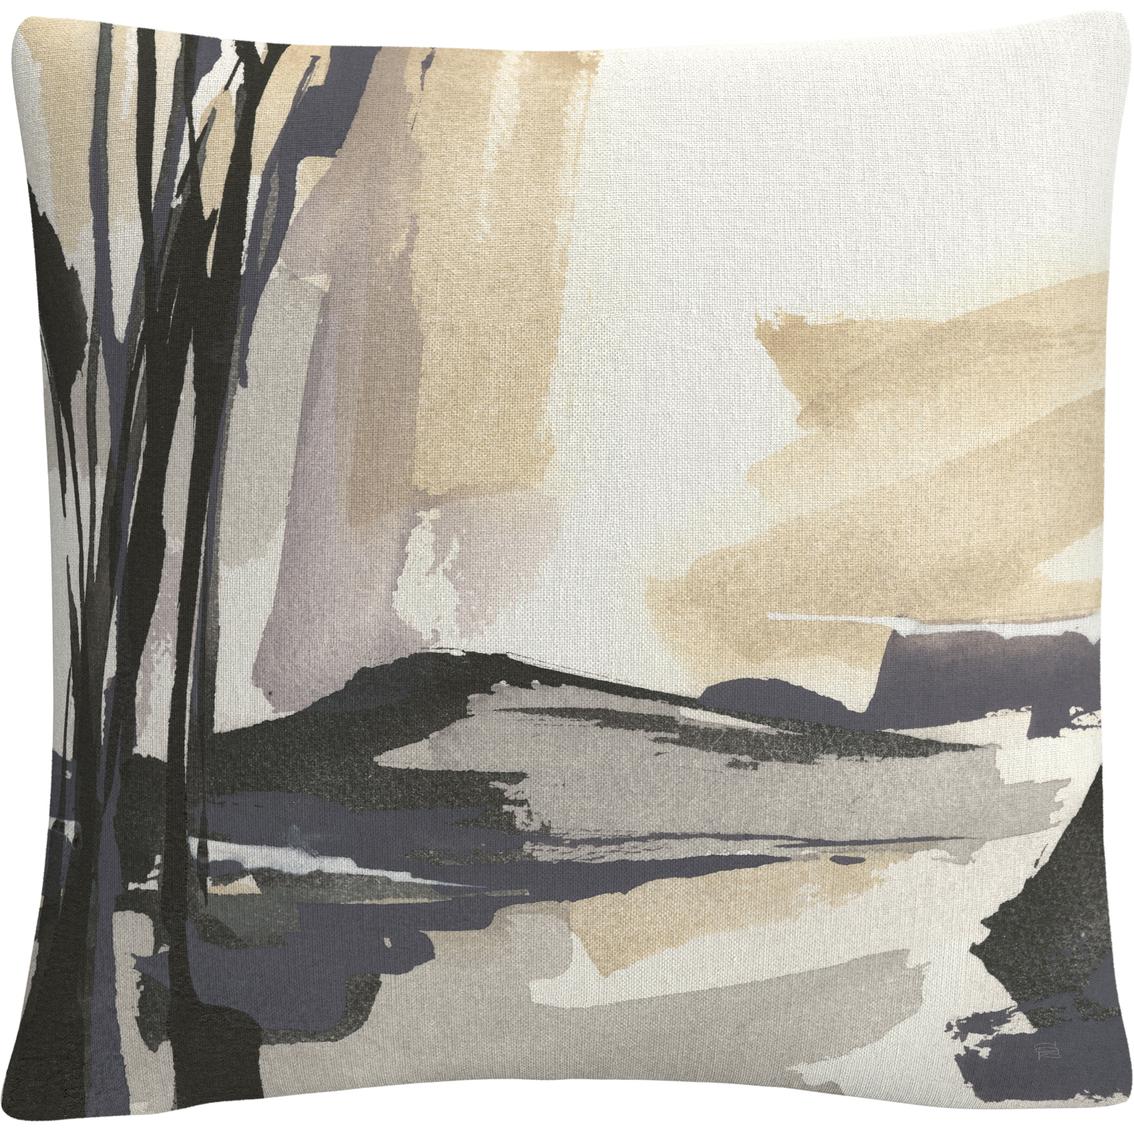 Trademark Fine Art Chris Paschke Placid Iv Decorative Throw Pillow Throw Pillows Household Shop The Exchange